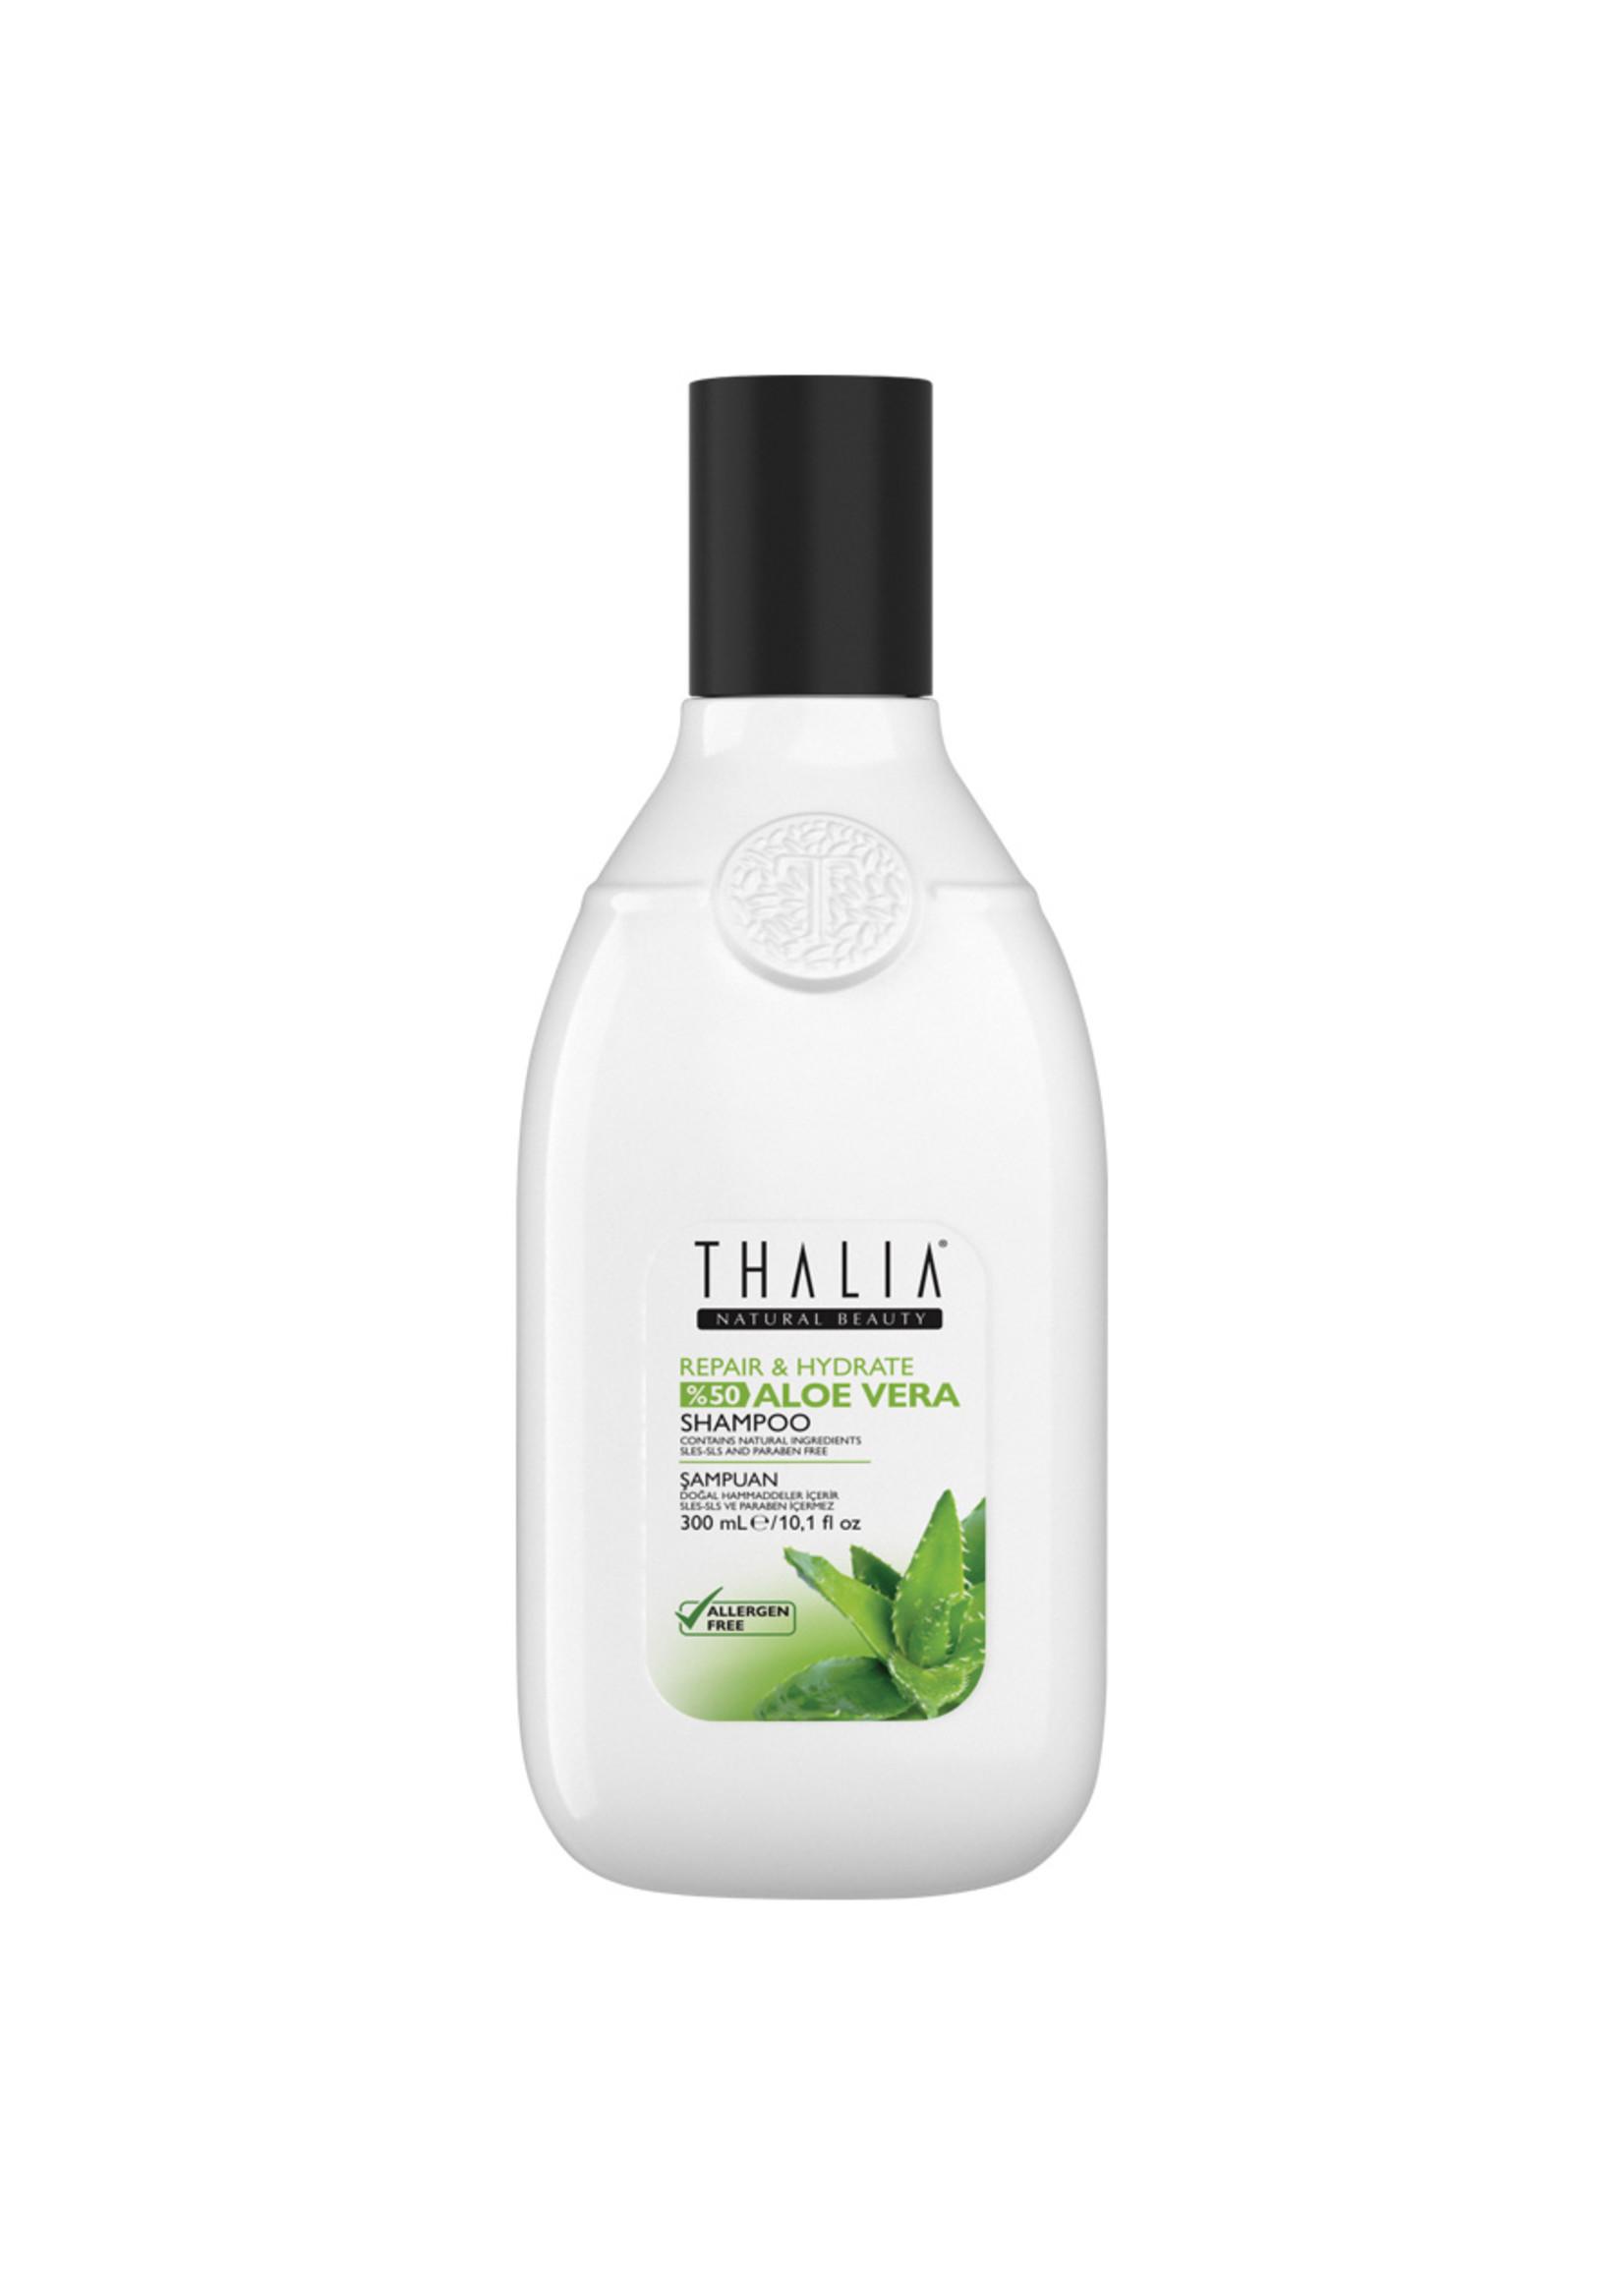 Thalia Aloe Vera Shampoo 300 ml